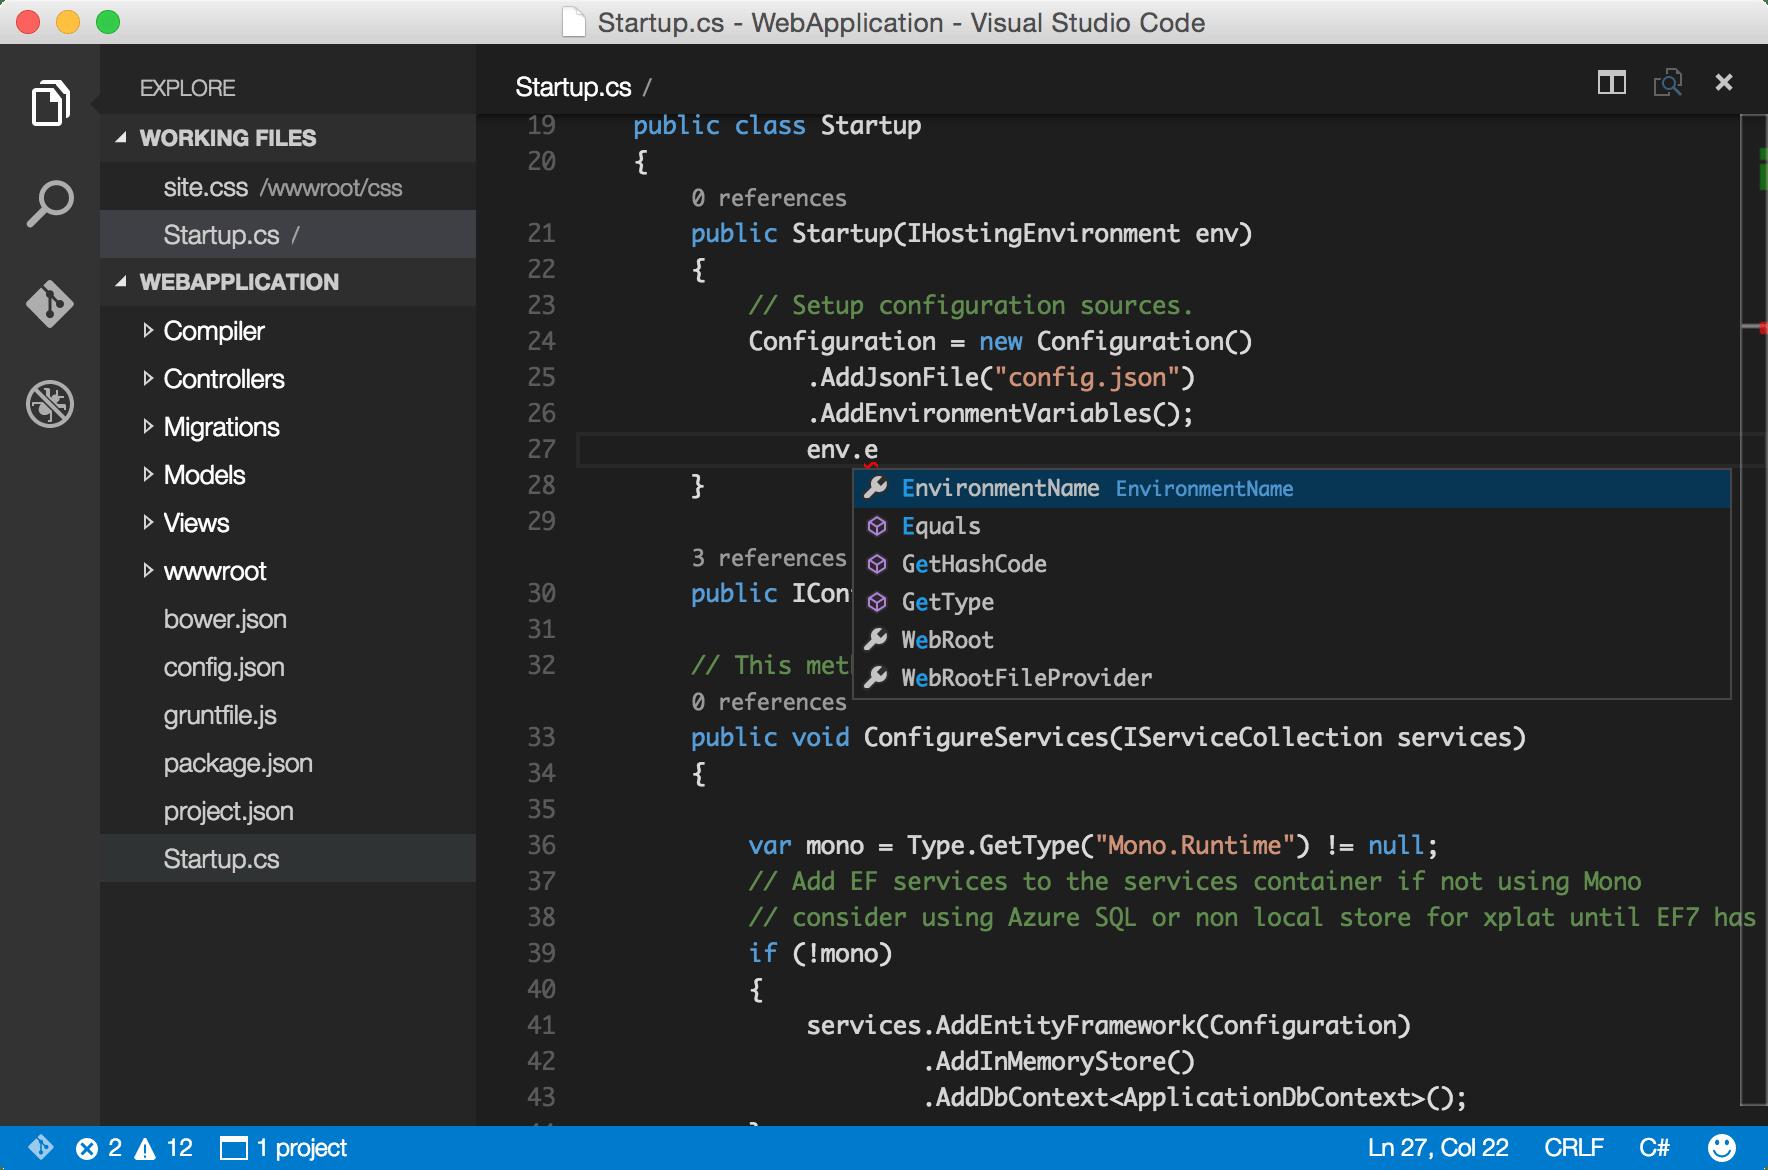 Introducing Visual Studio Code - A Free, Cross-Platform Code Editor